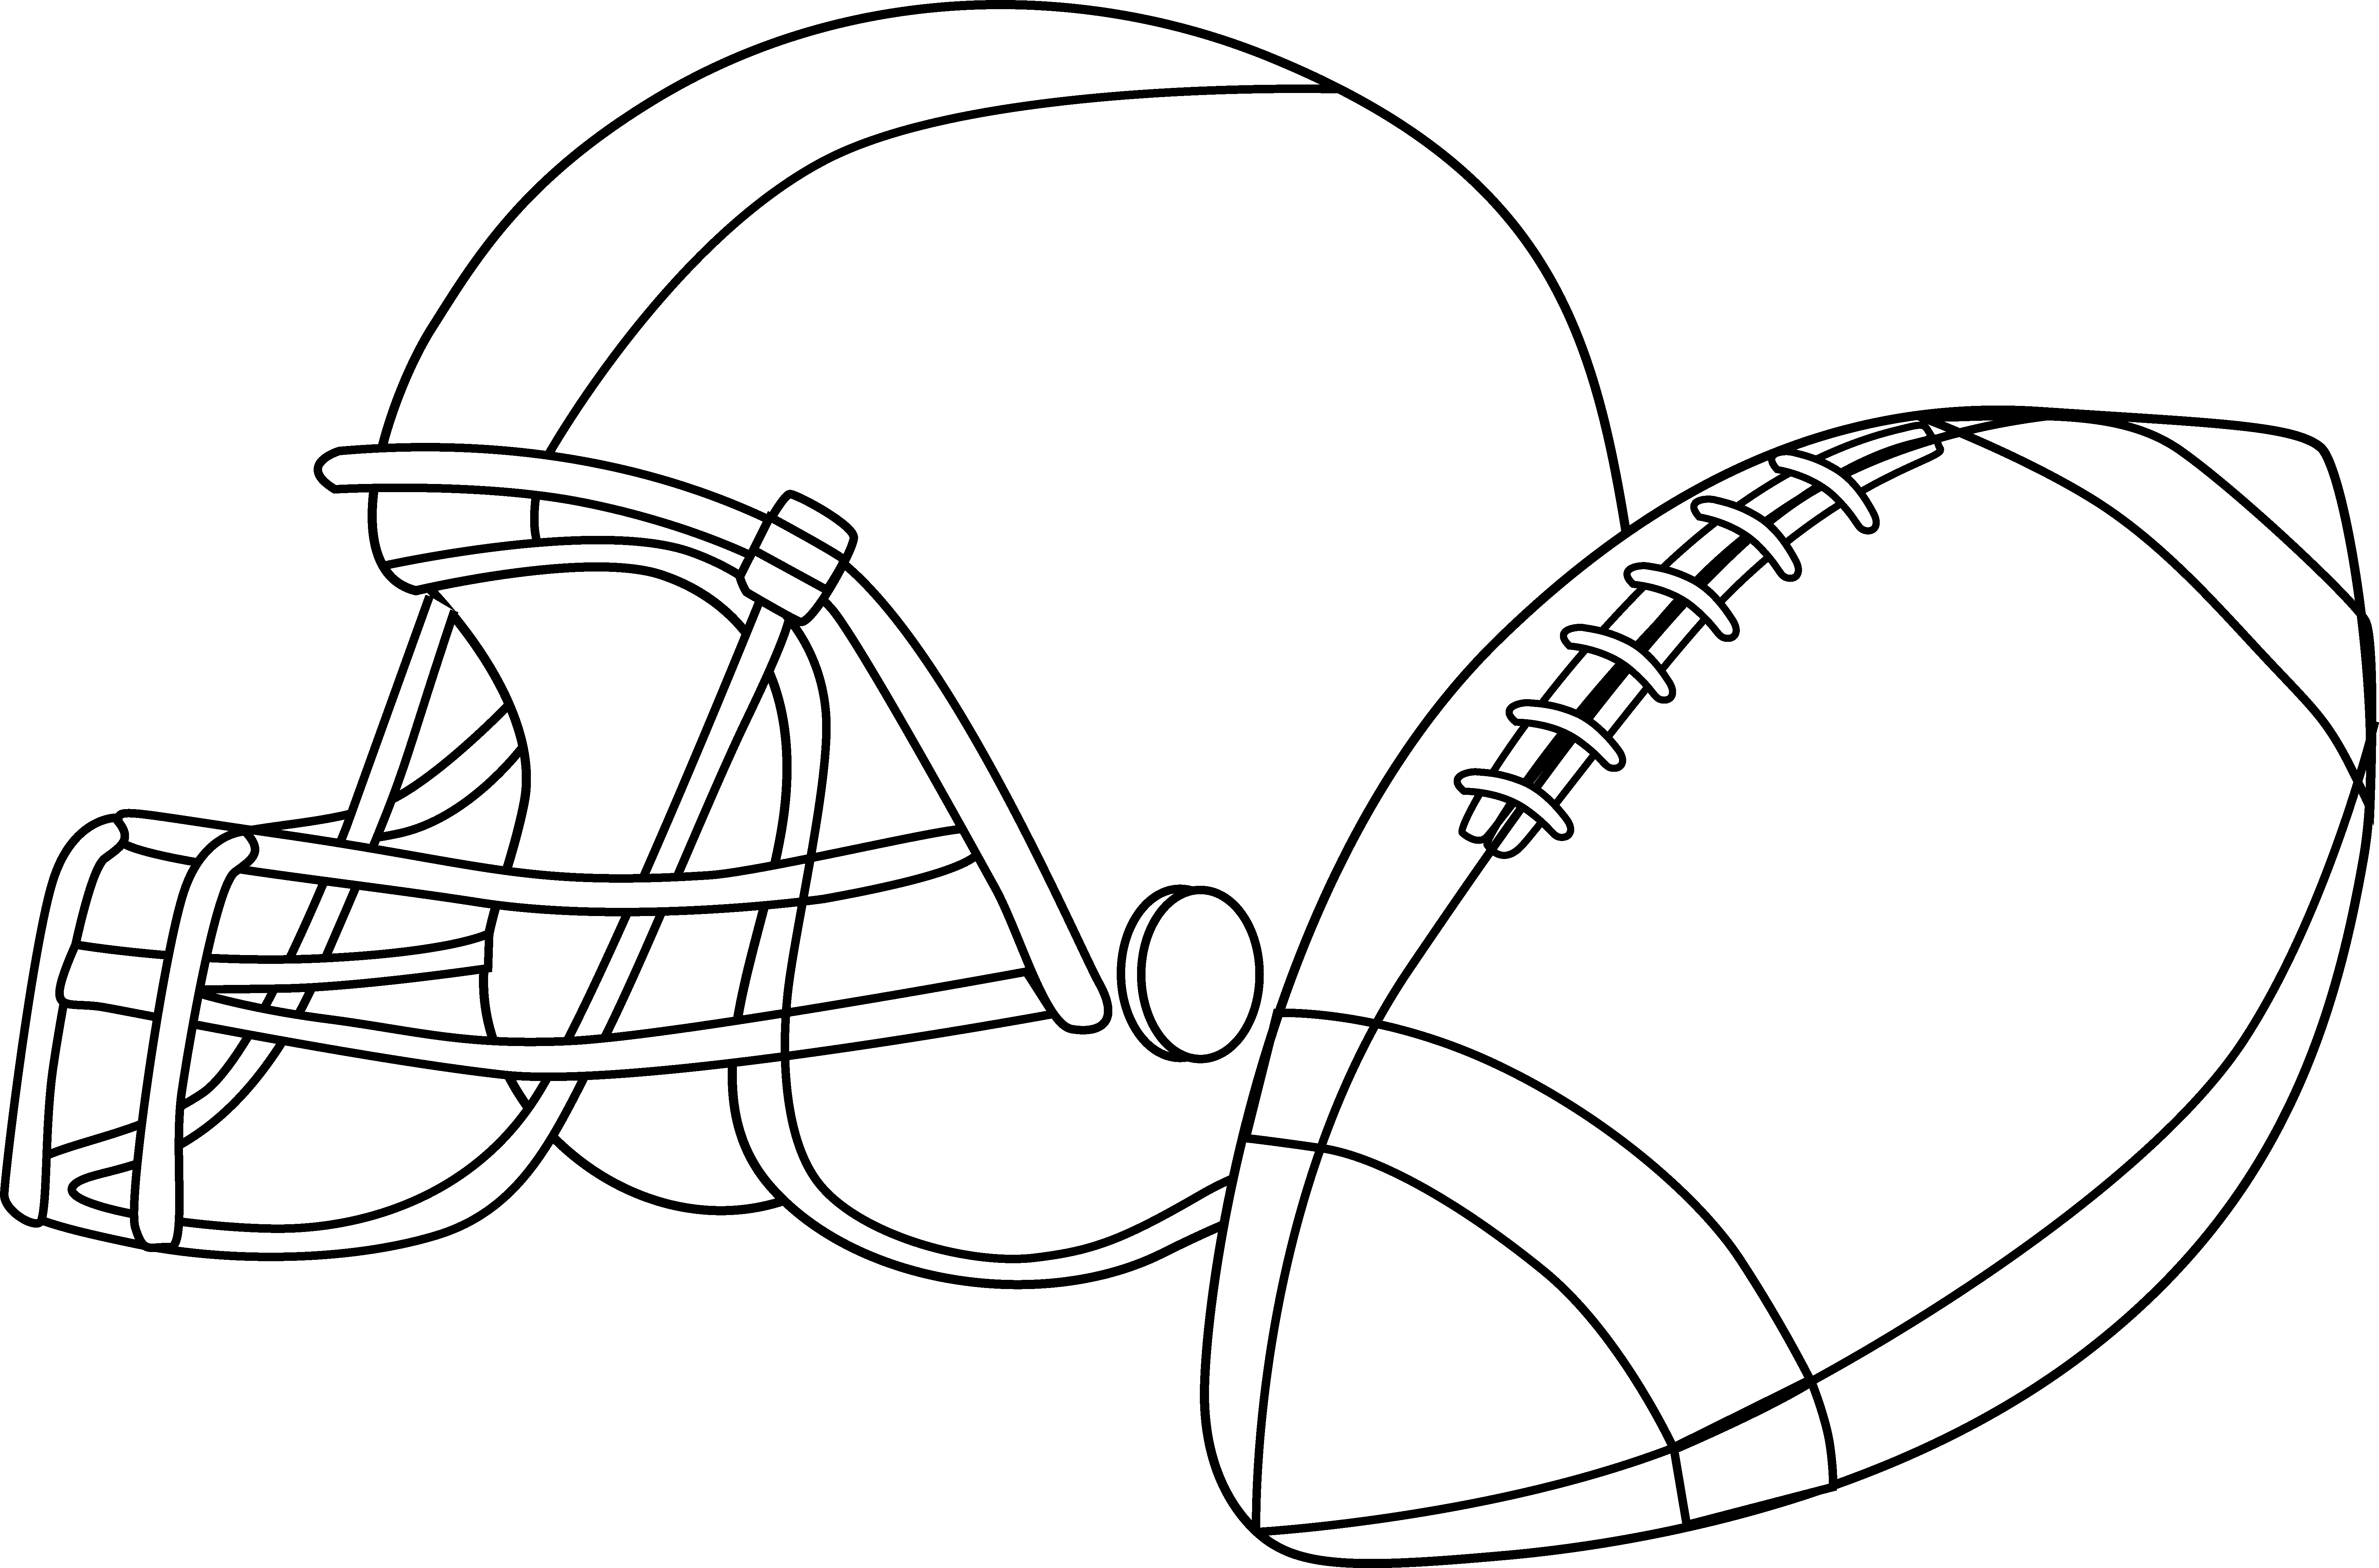 Free Football Line Art, Download Free Clip Art, Free Clip.